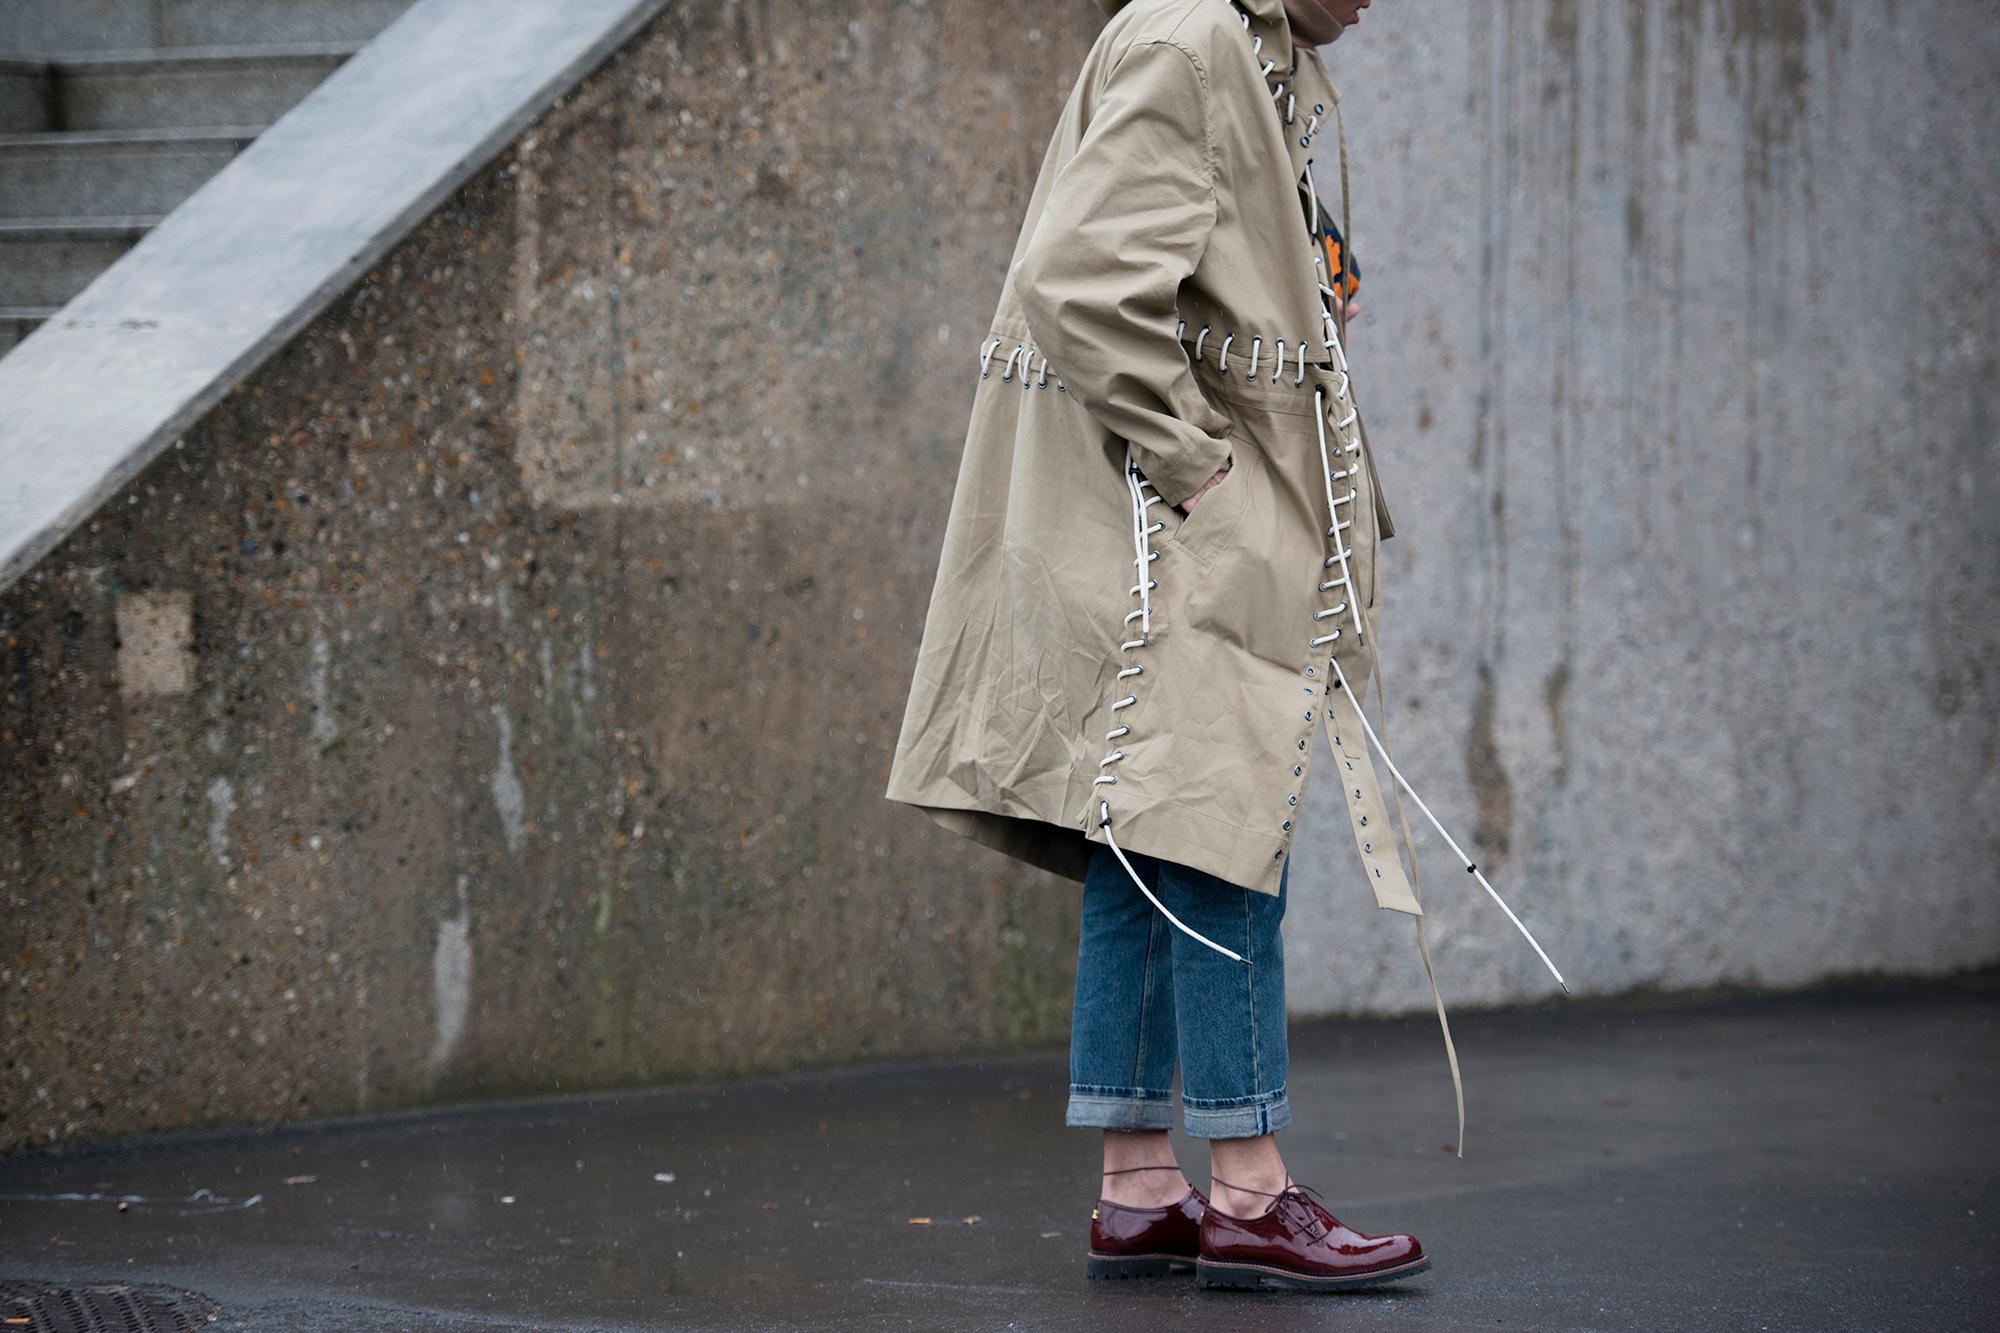 Streetsnaps Paris Fashion Week March 2017 Part 1 Hypebeast - 3744006